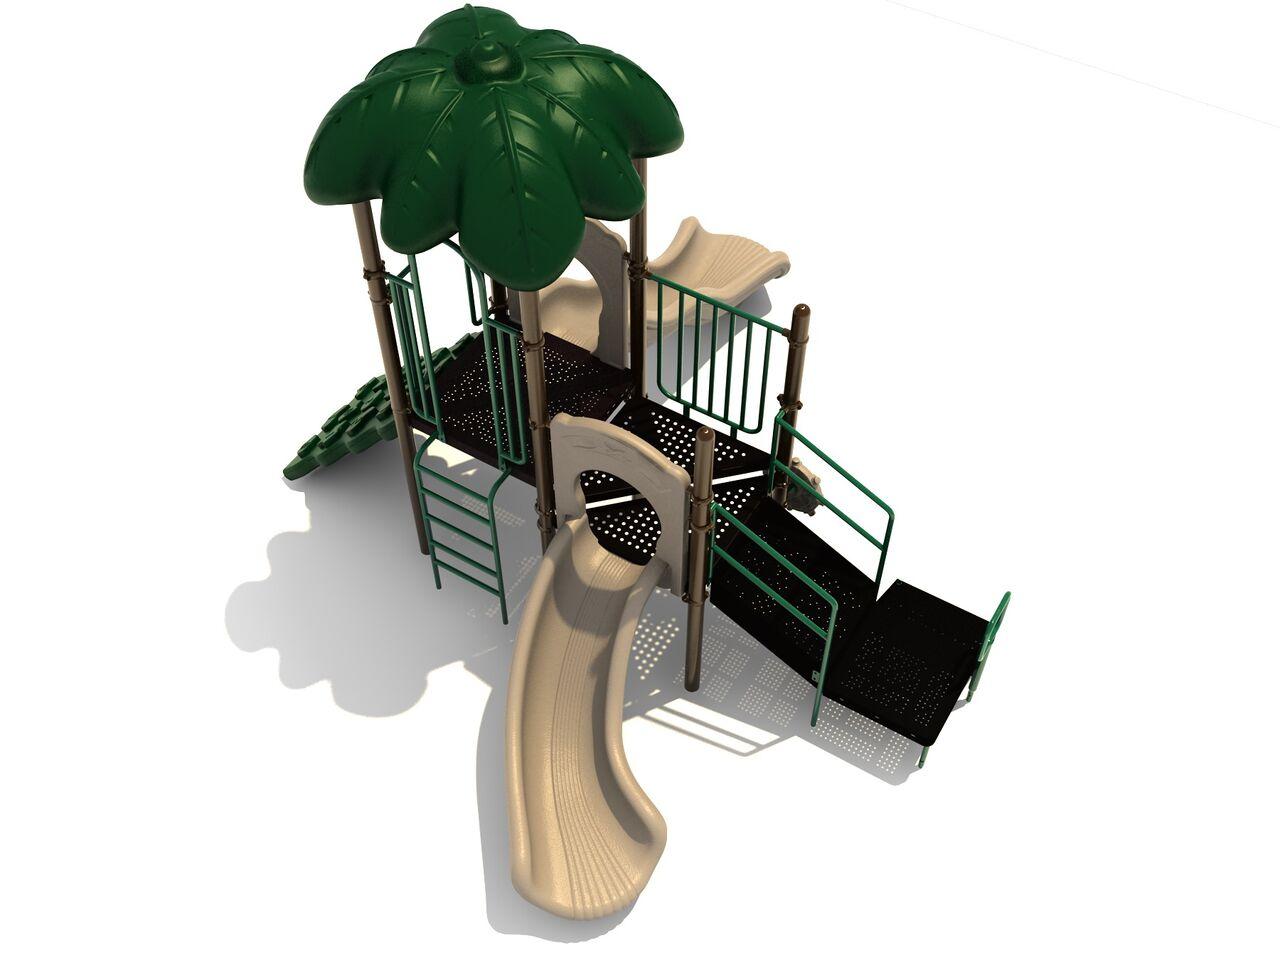 Village Greens Playground Et Amp T Distributor Inc